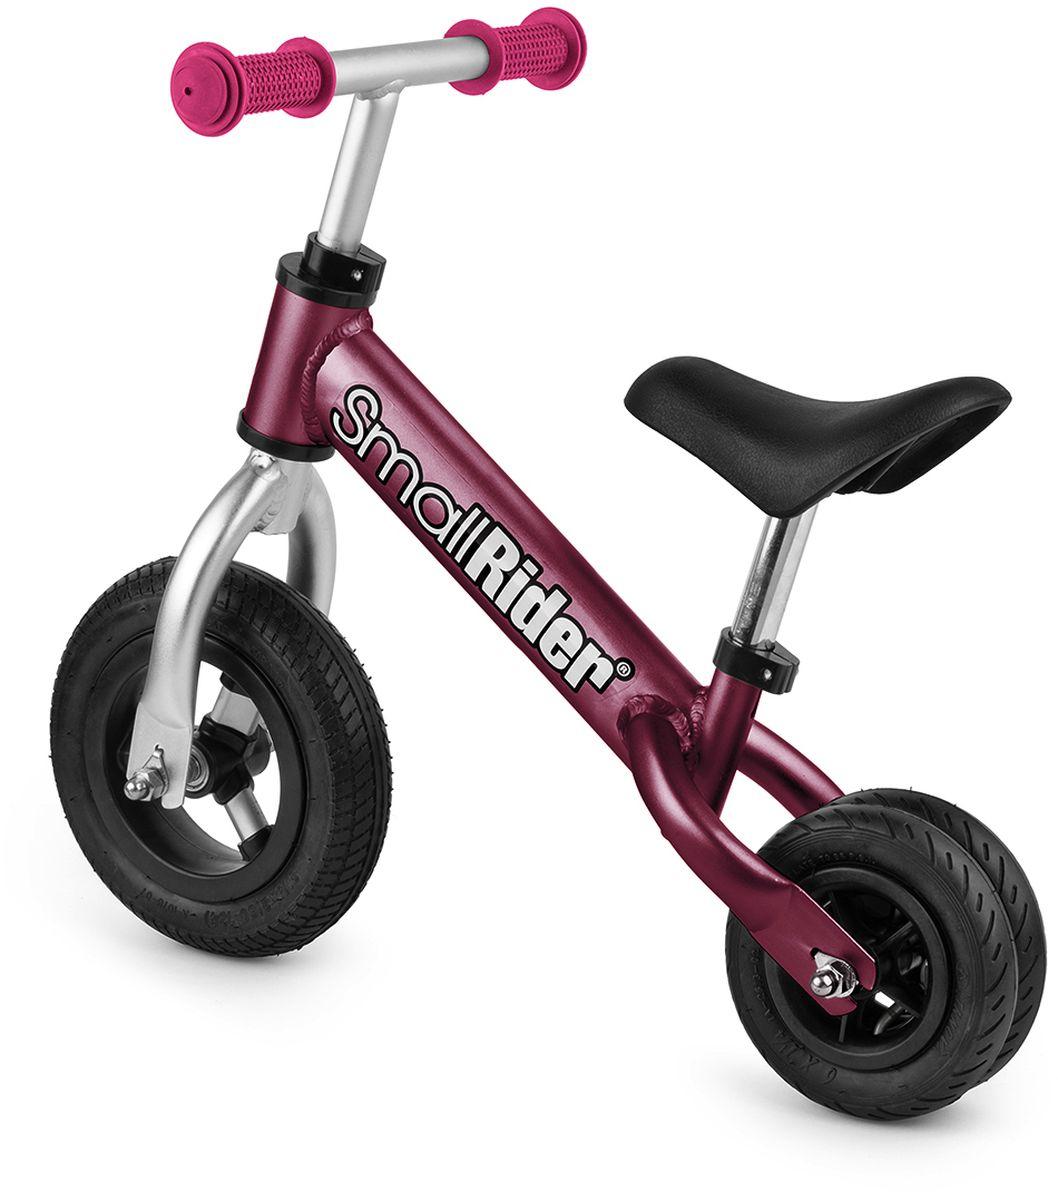 Small Rider Беговел-каталка для малышей Jimmy цвет бордовый -  Беговелы